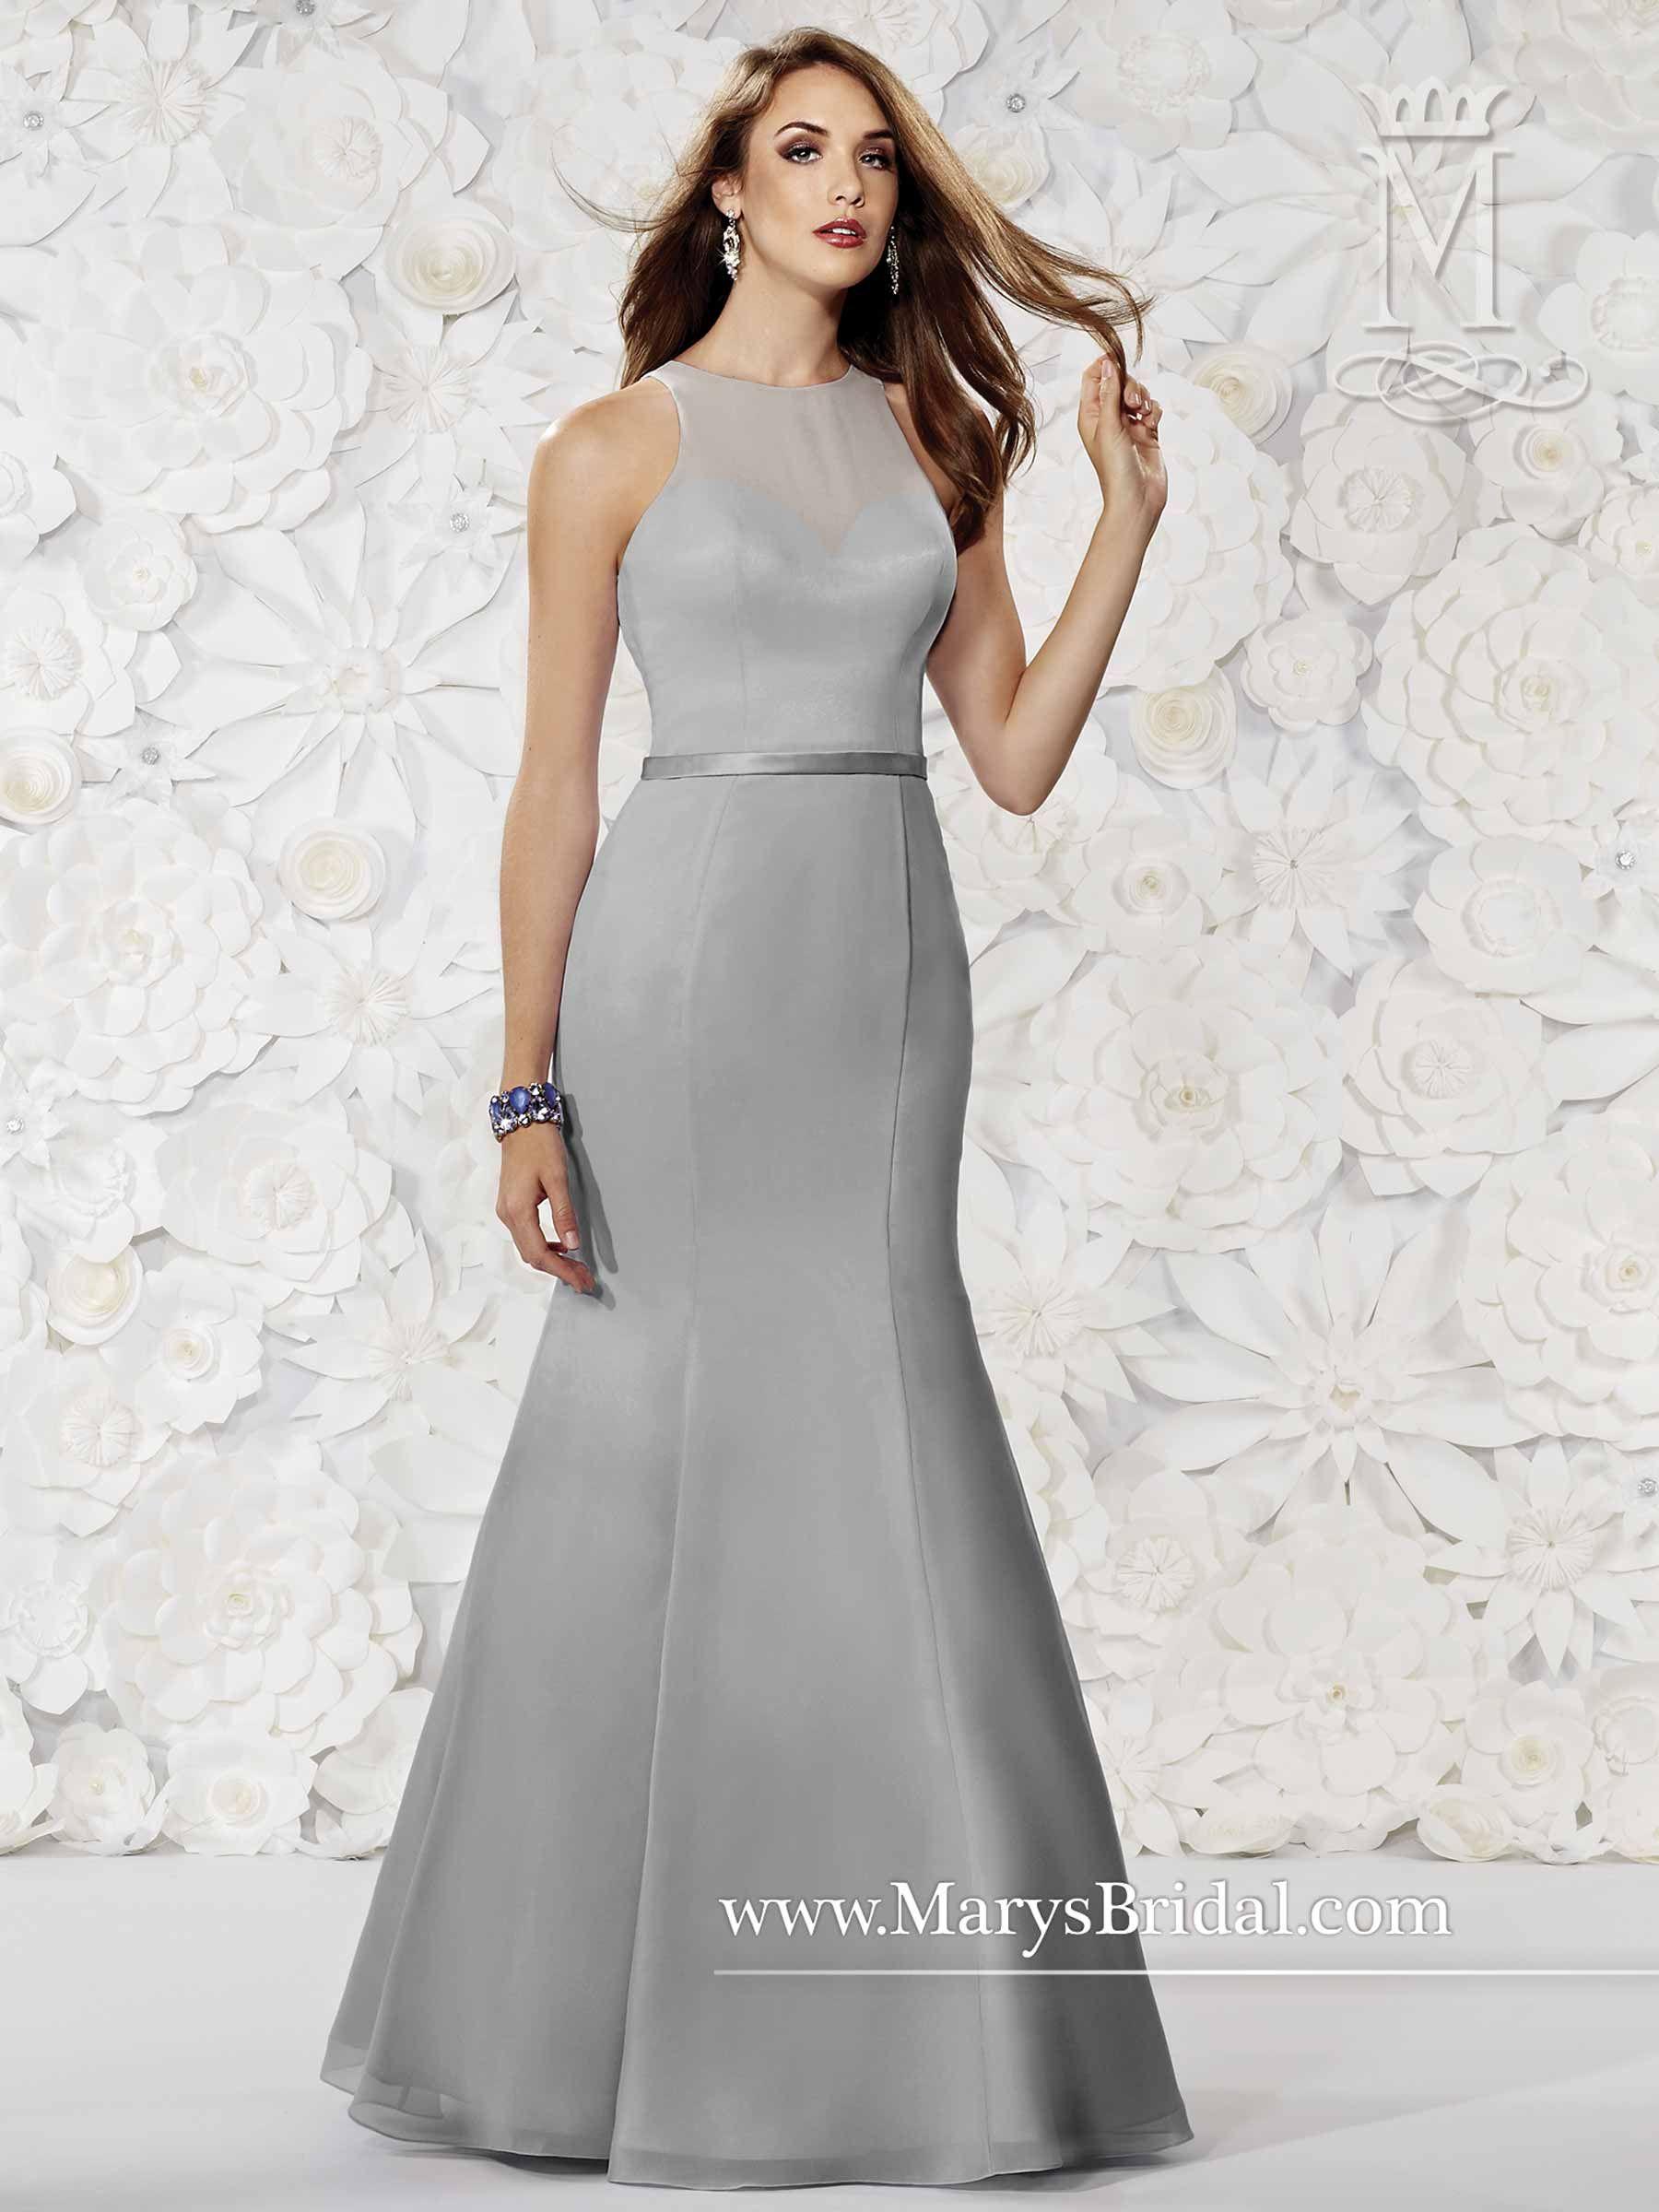 pinbespoke fashion reps on blue/gray wedding inspiration